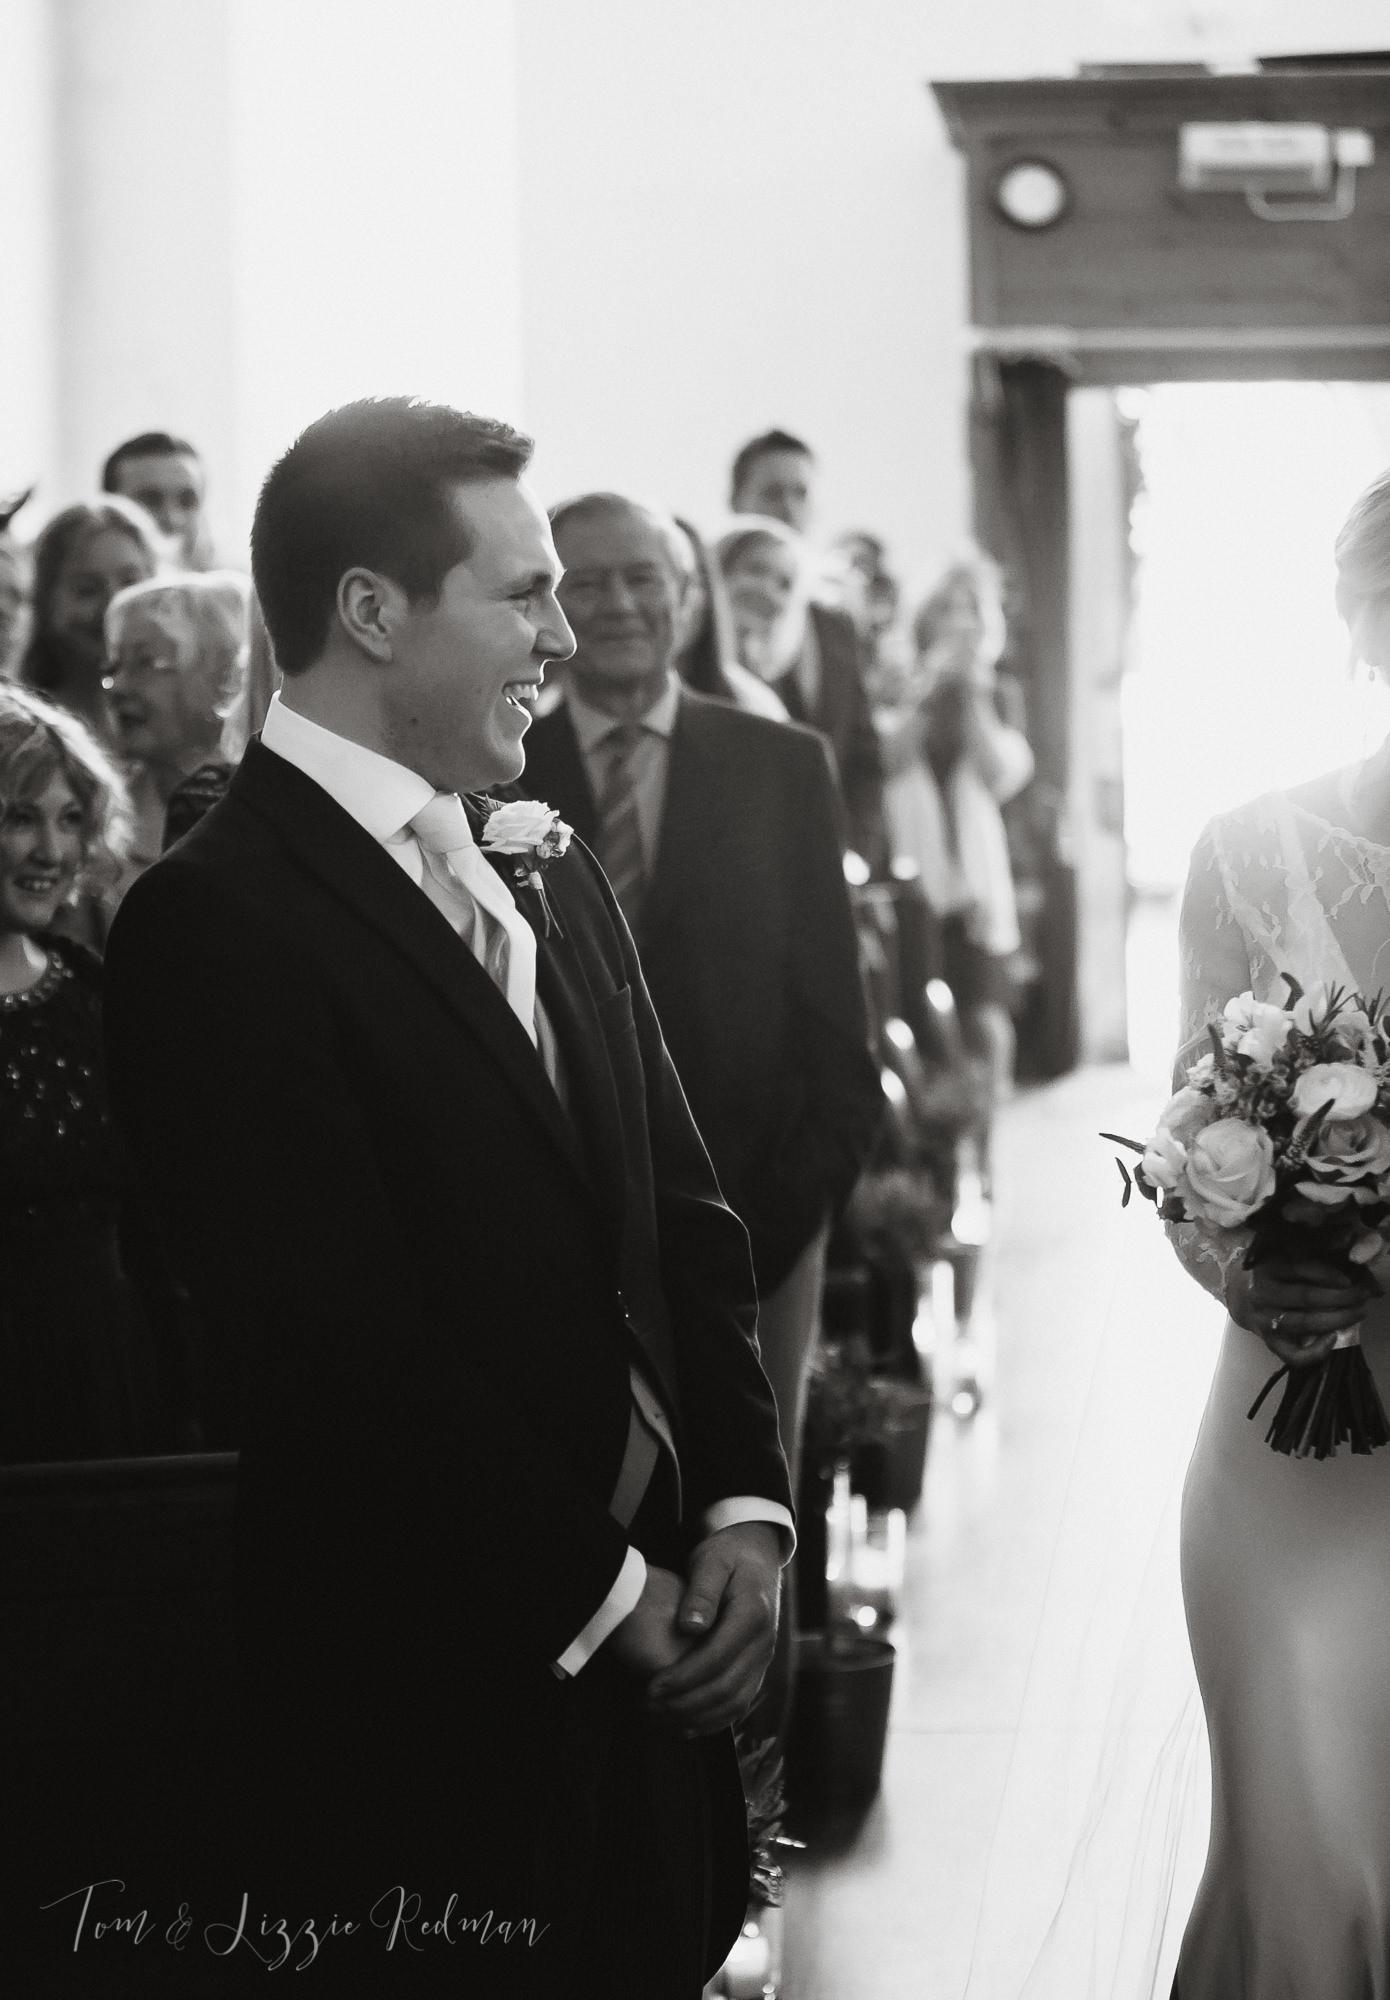 Dorset wedding photographers Tom & Lizzie Redman 018.jpg